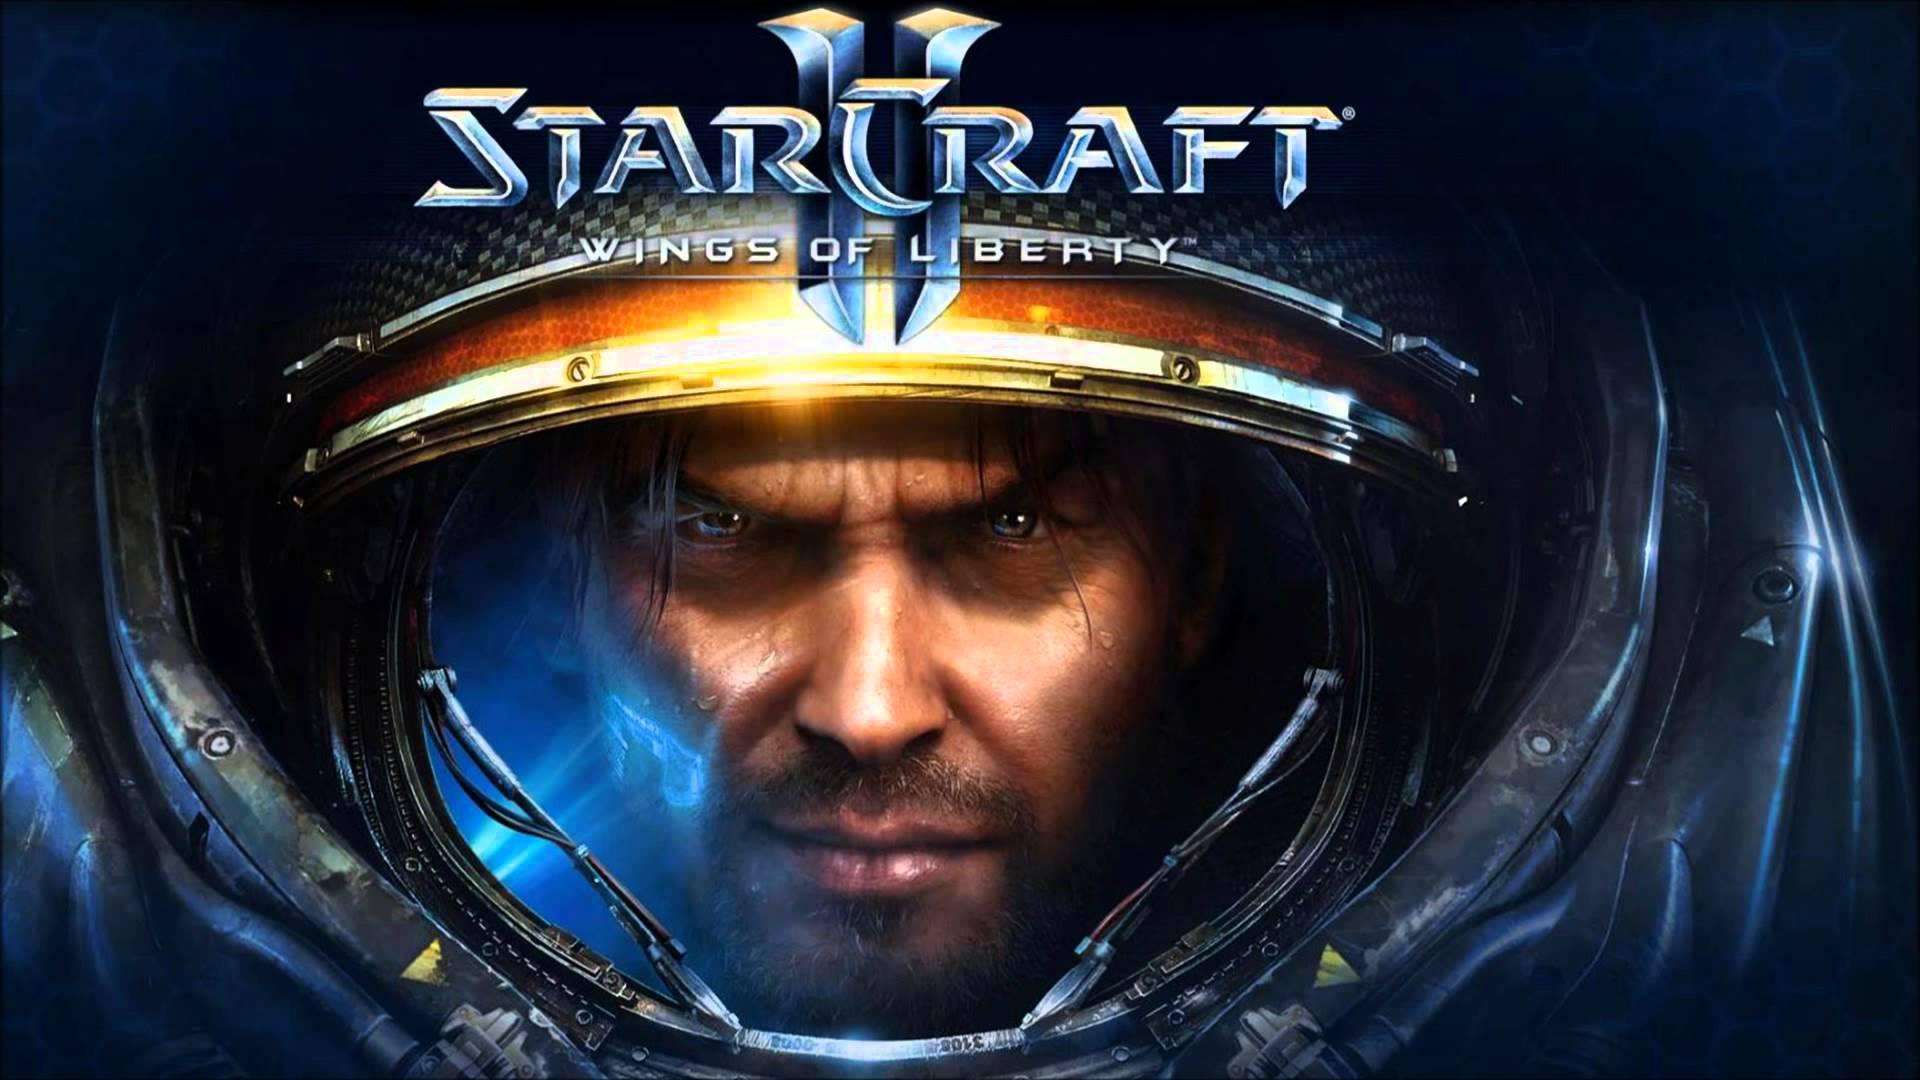 Starcraft 2 gratis